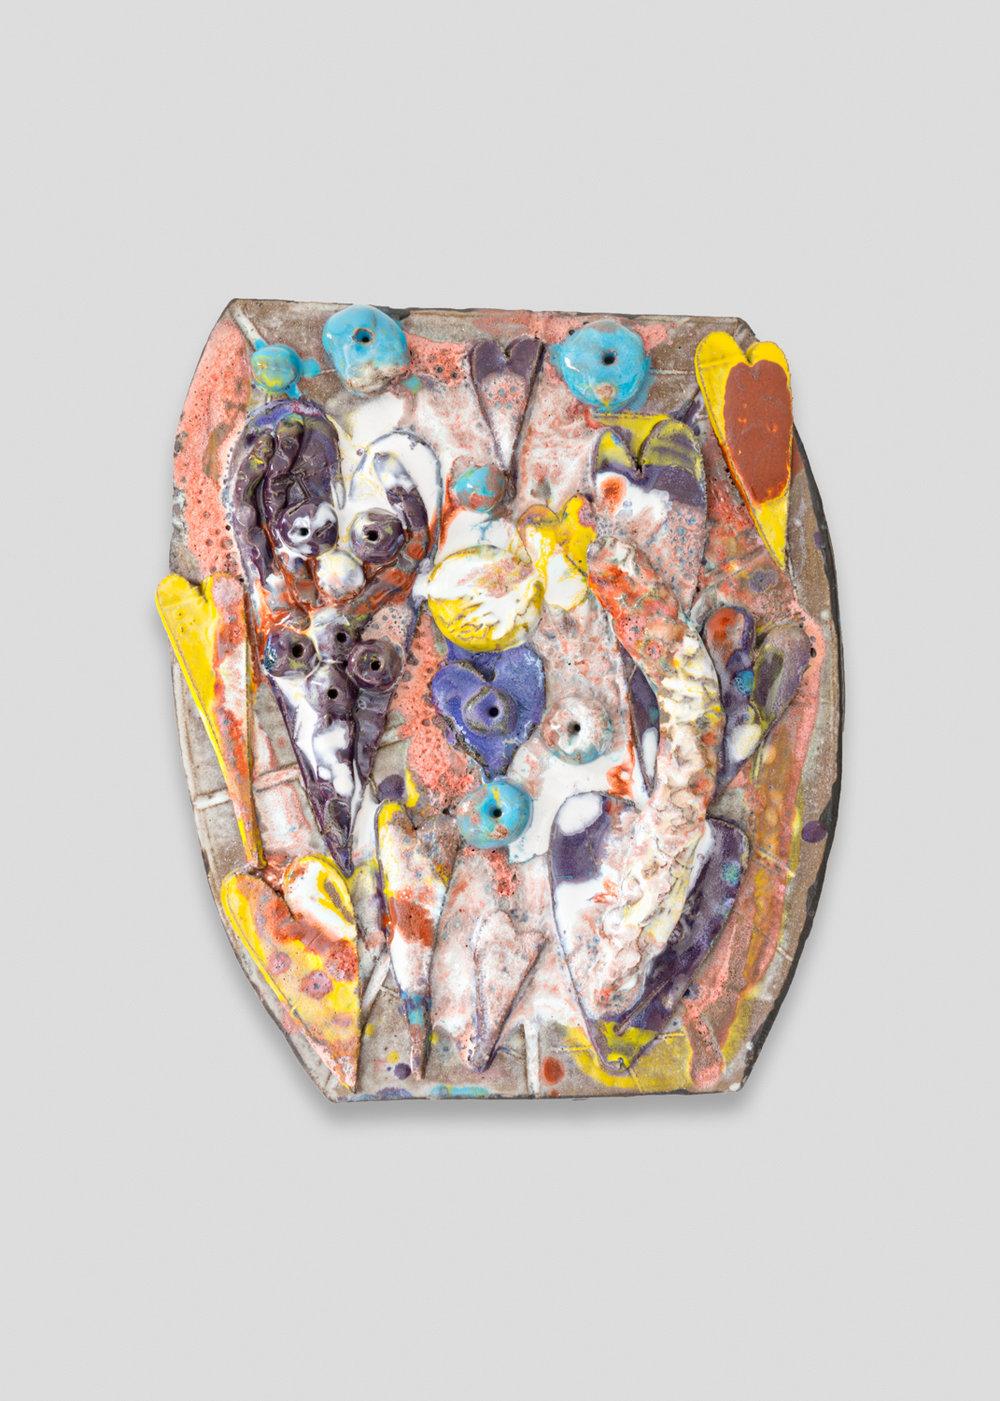 William J.O'Brien  Untitled  2017 Glazed ceramic 17h x 14w x 3d in WOB1232